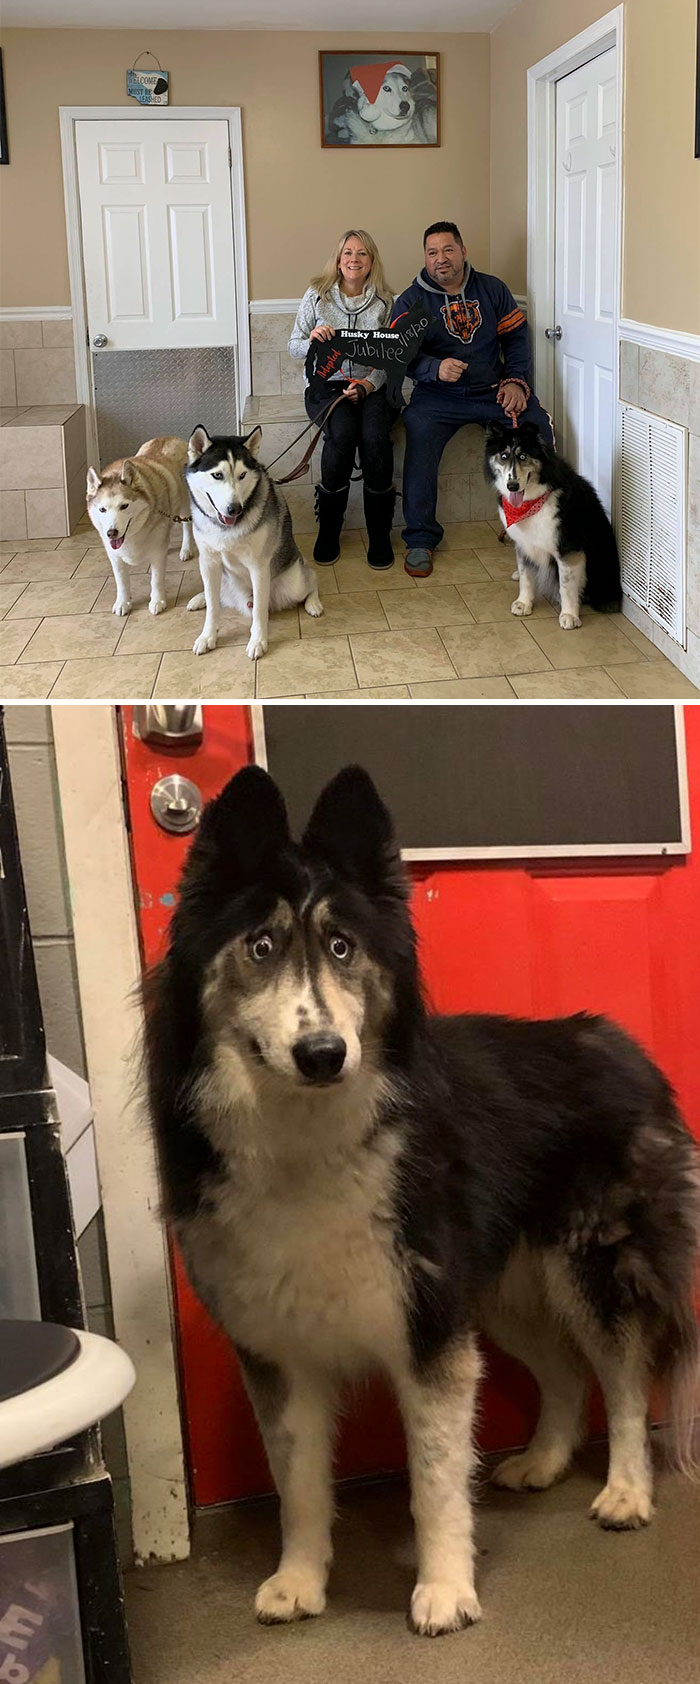 adopted pets 300 5e2f01c7c7a78 700